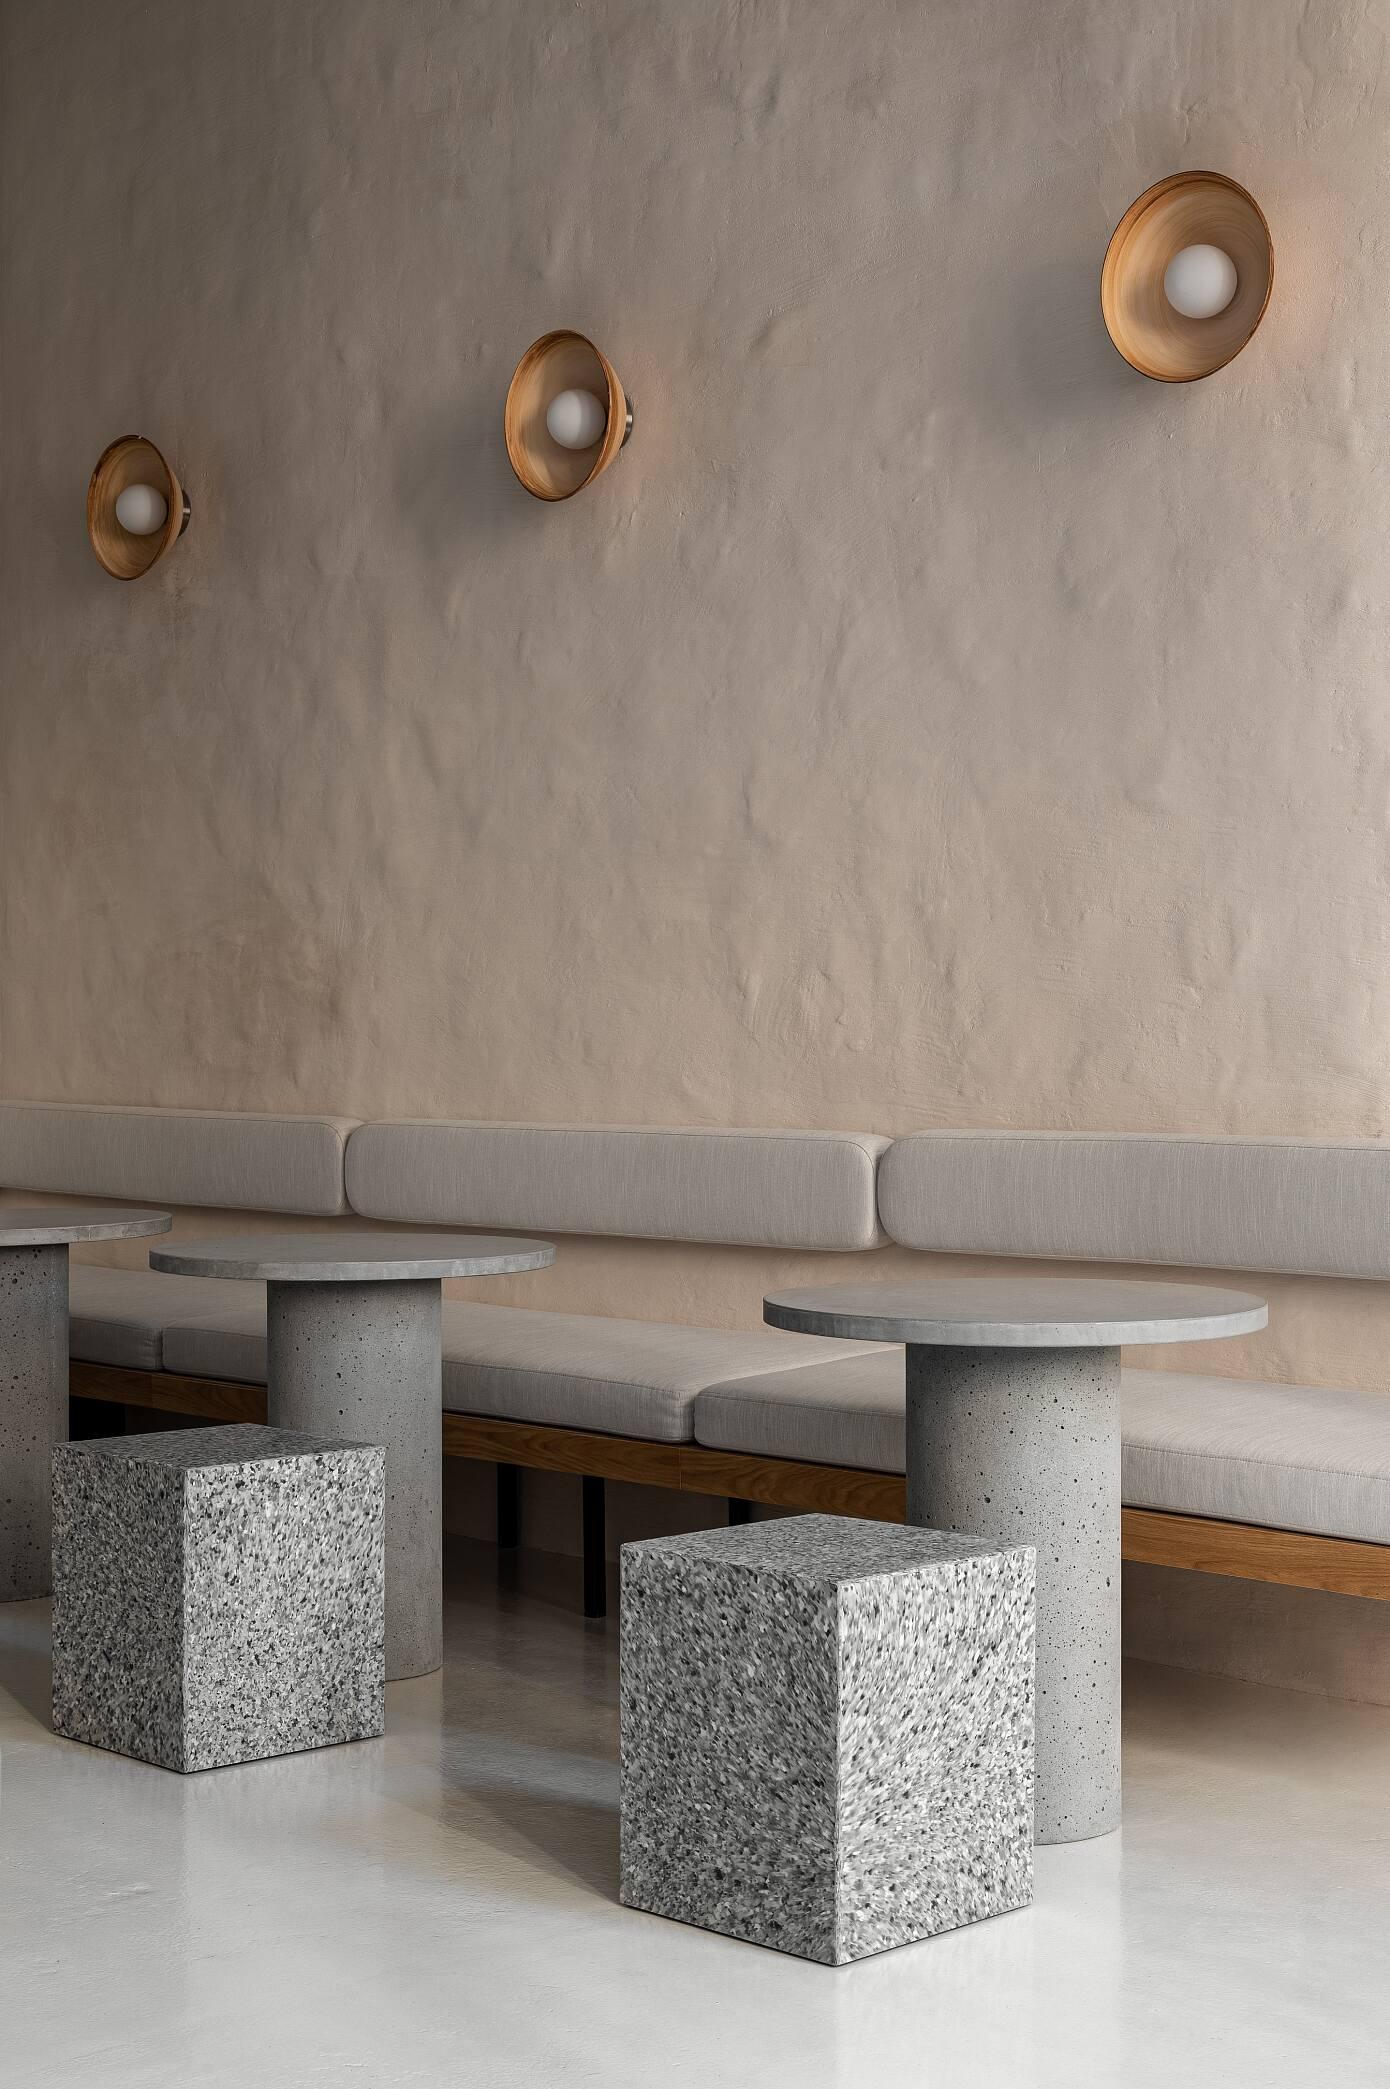 Istetyka by Yakusha Design